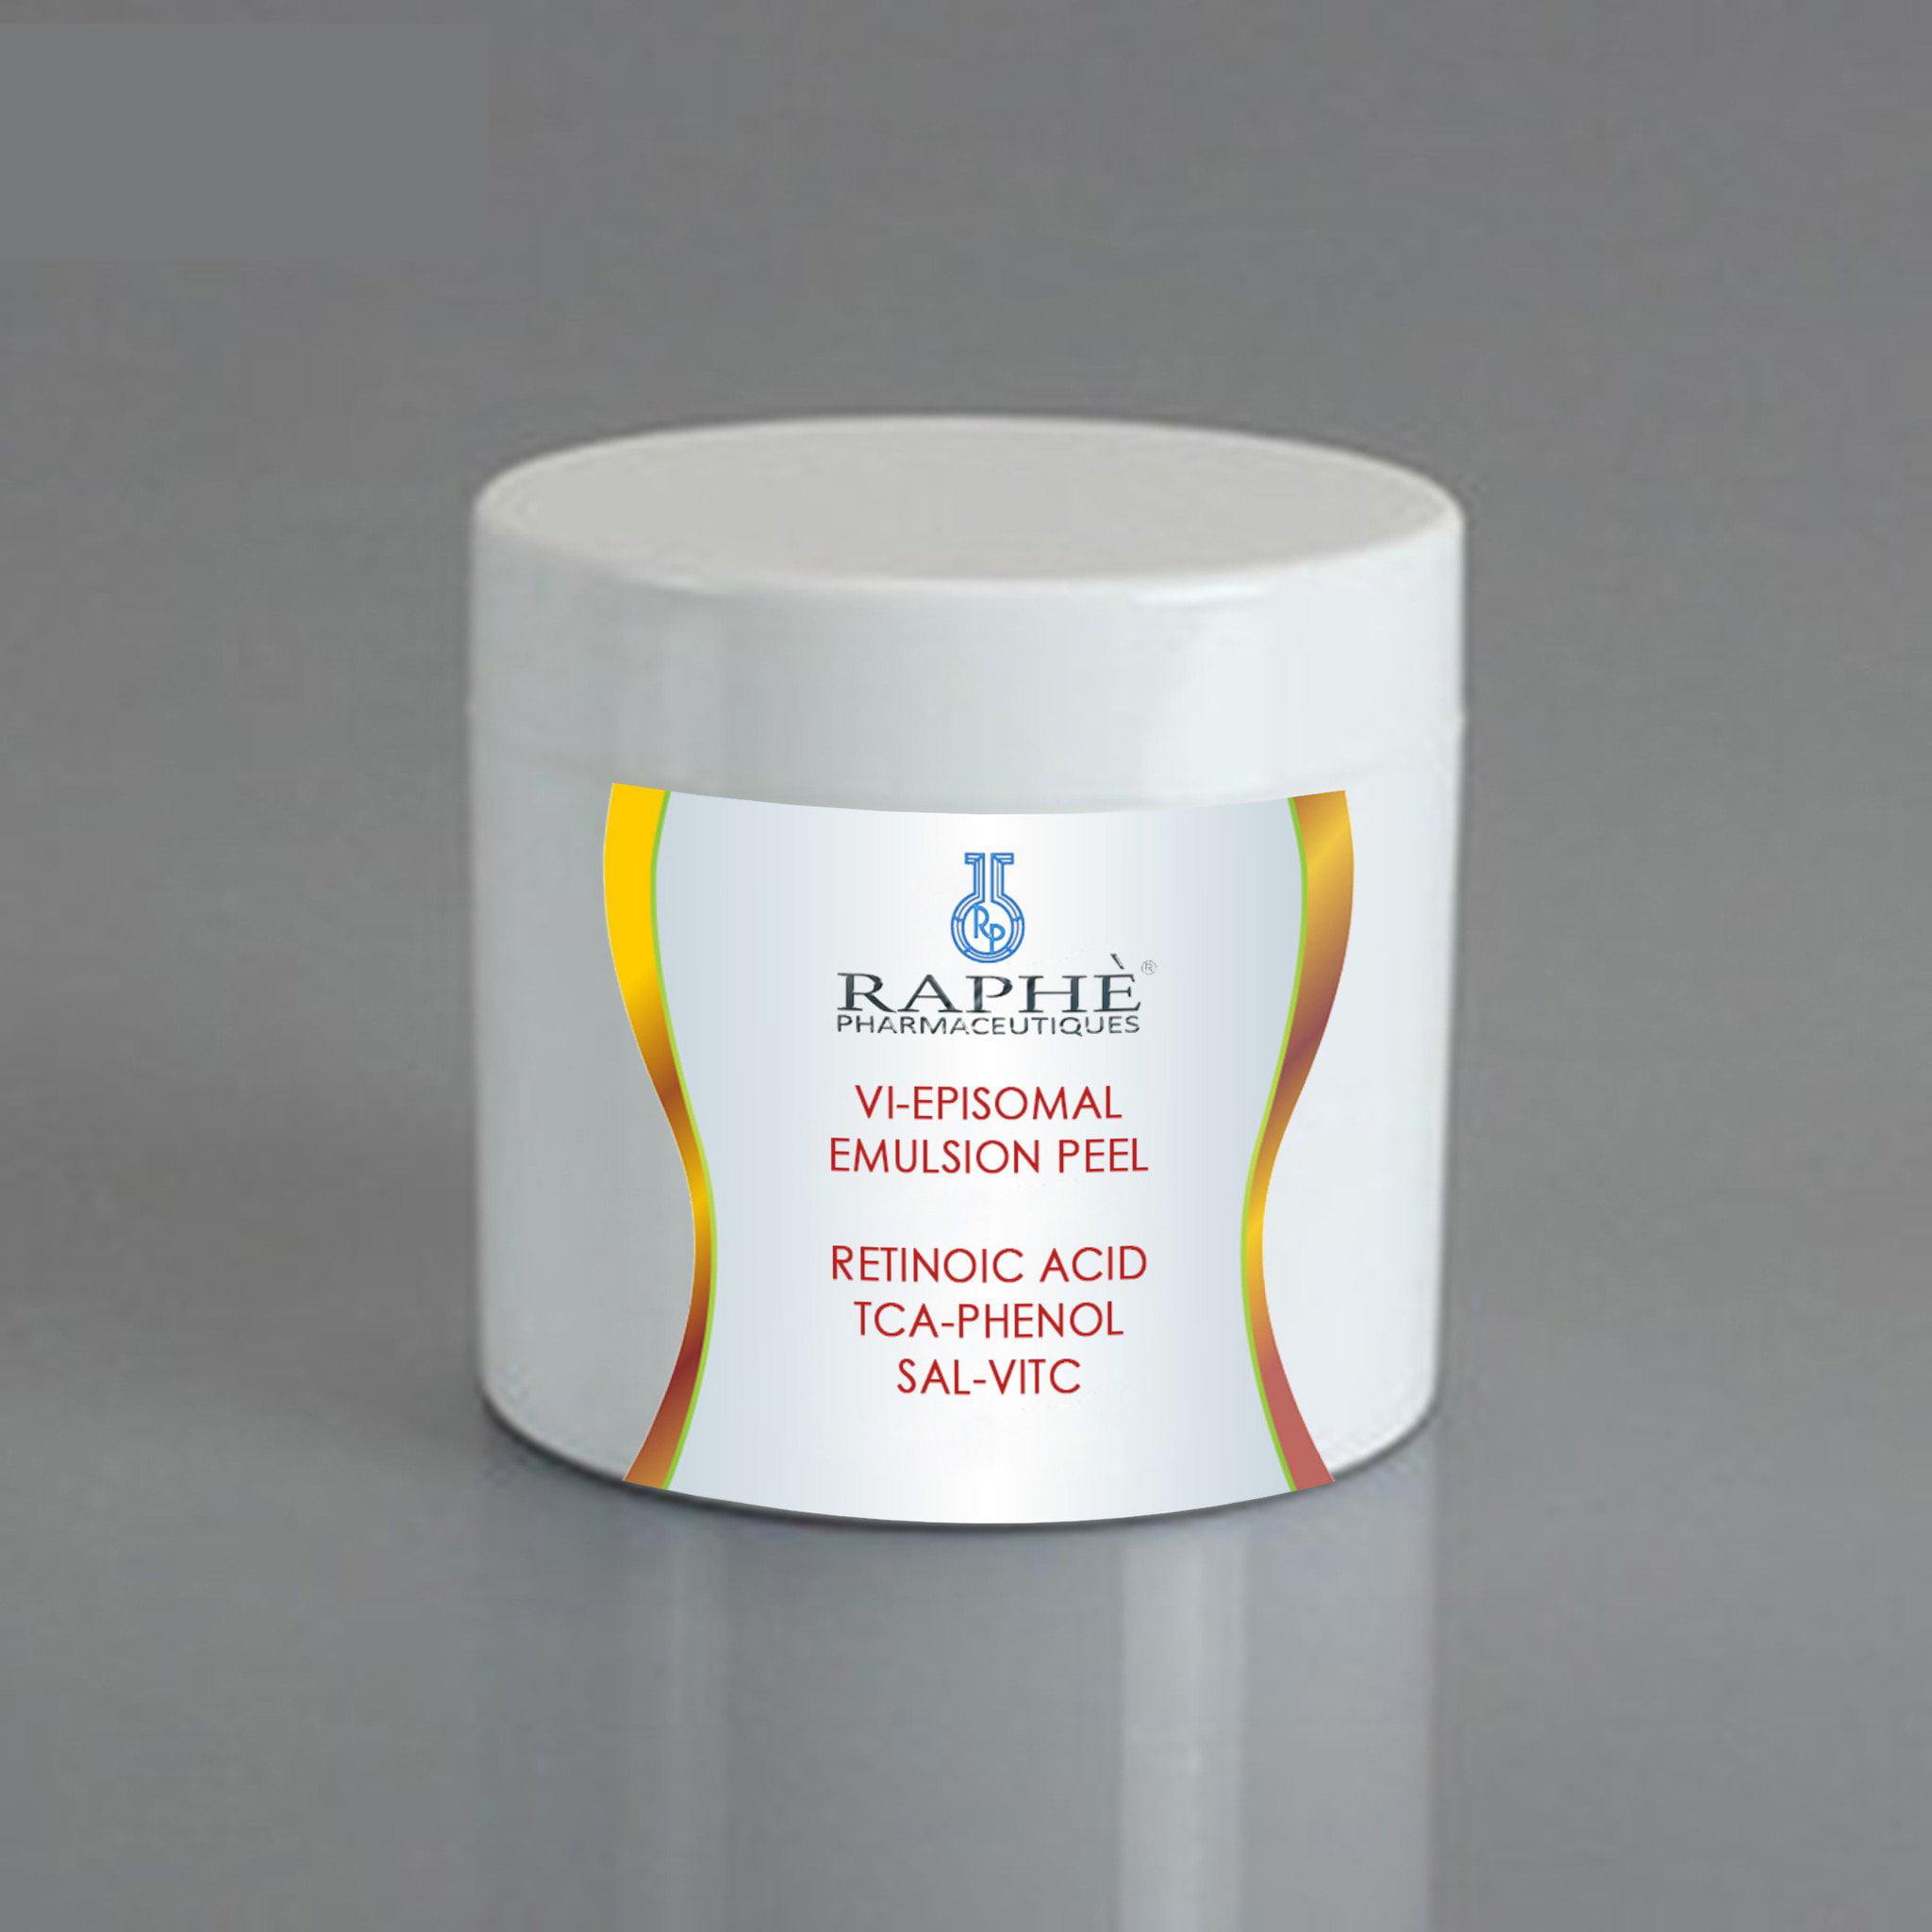 Creme Style Episomal Vi Peel For Professional Care 10lbs